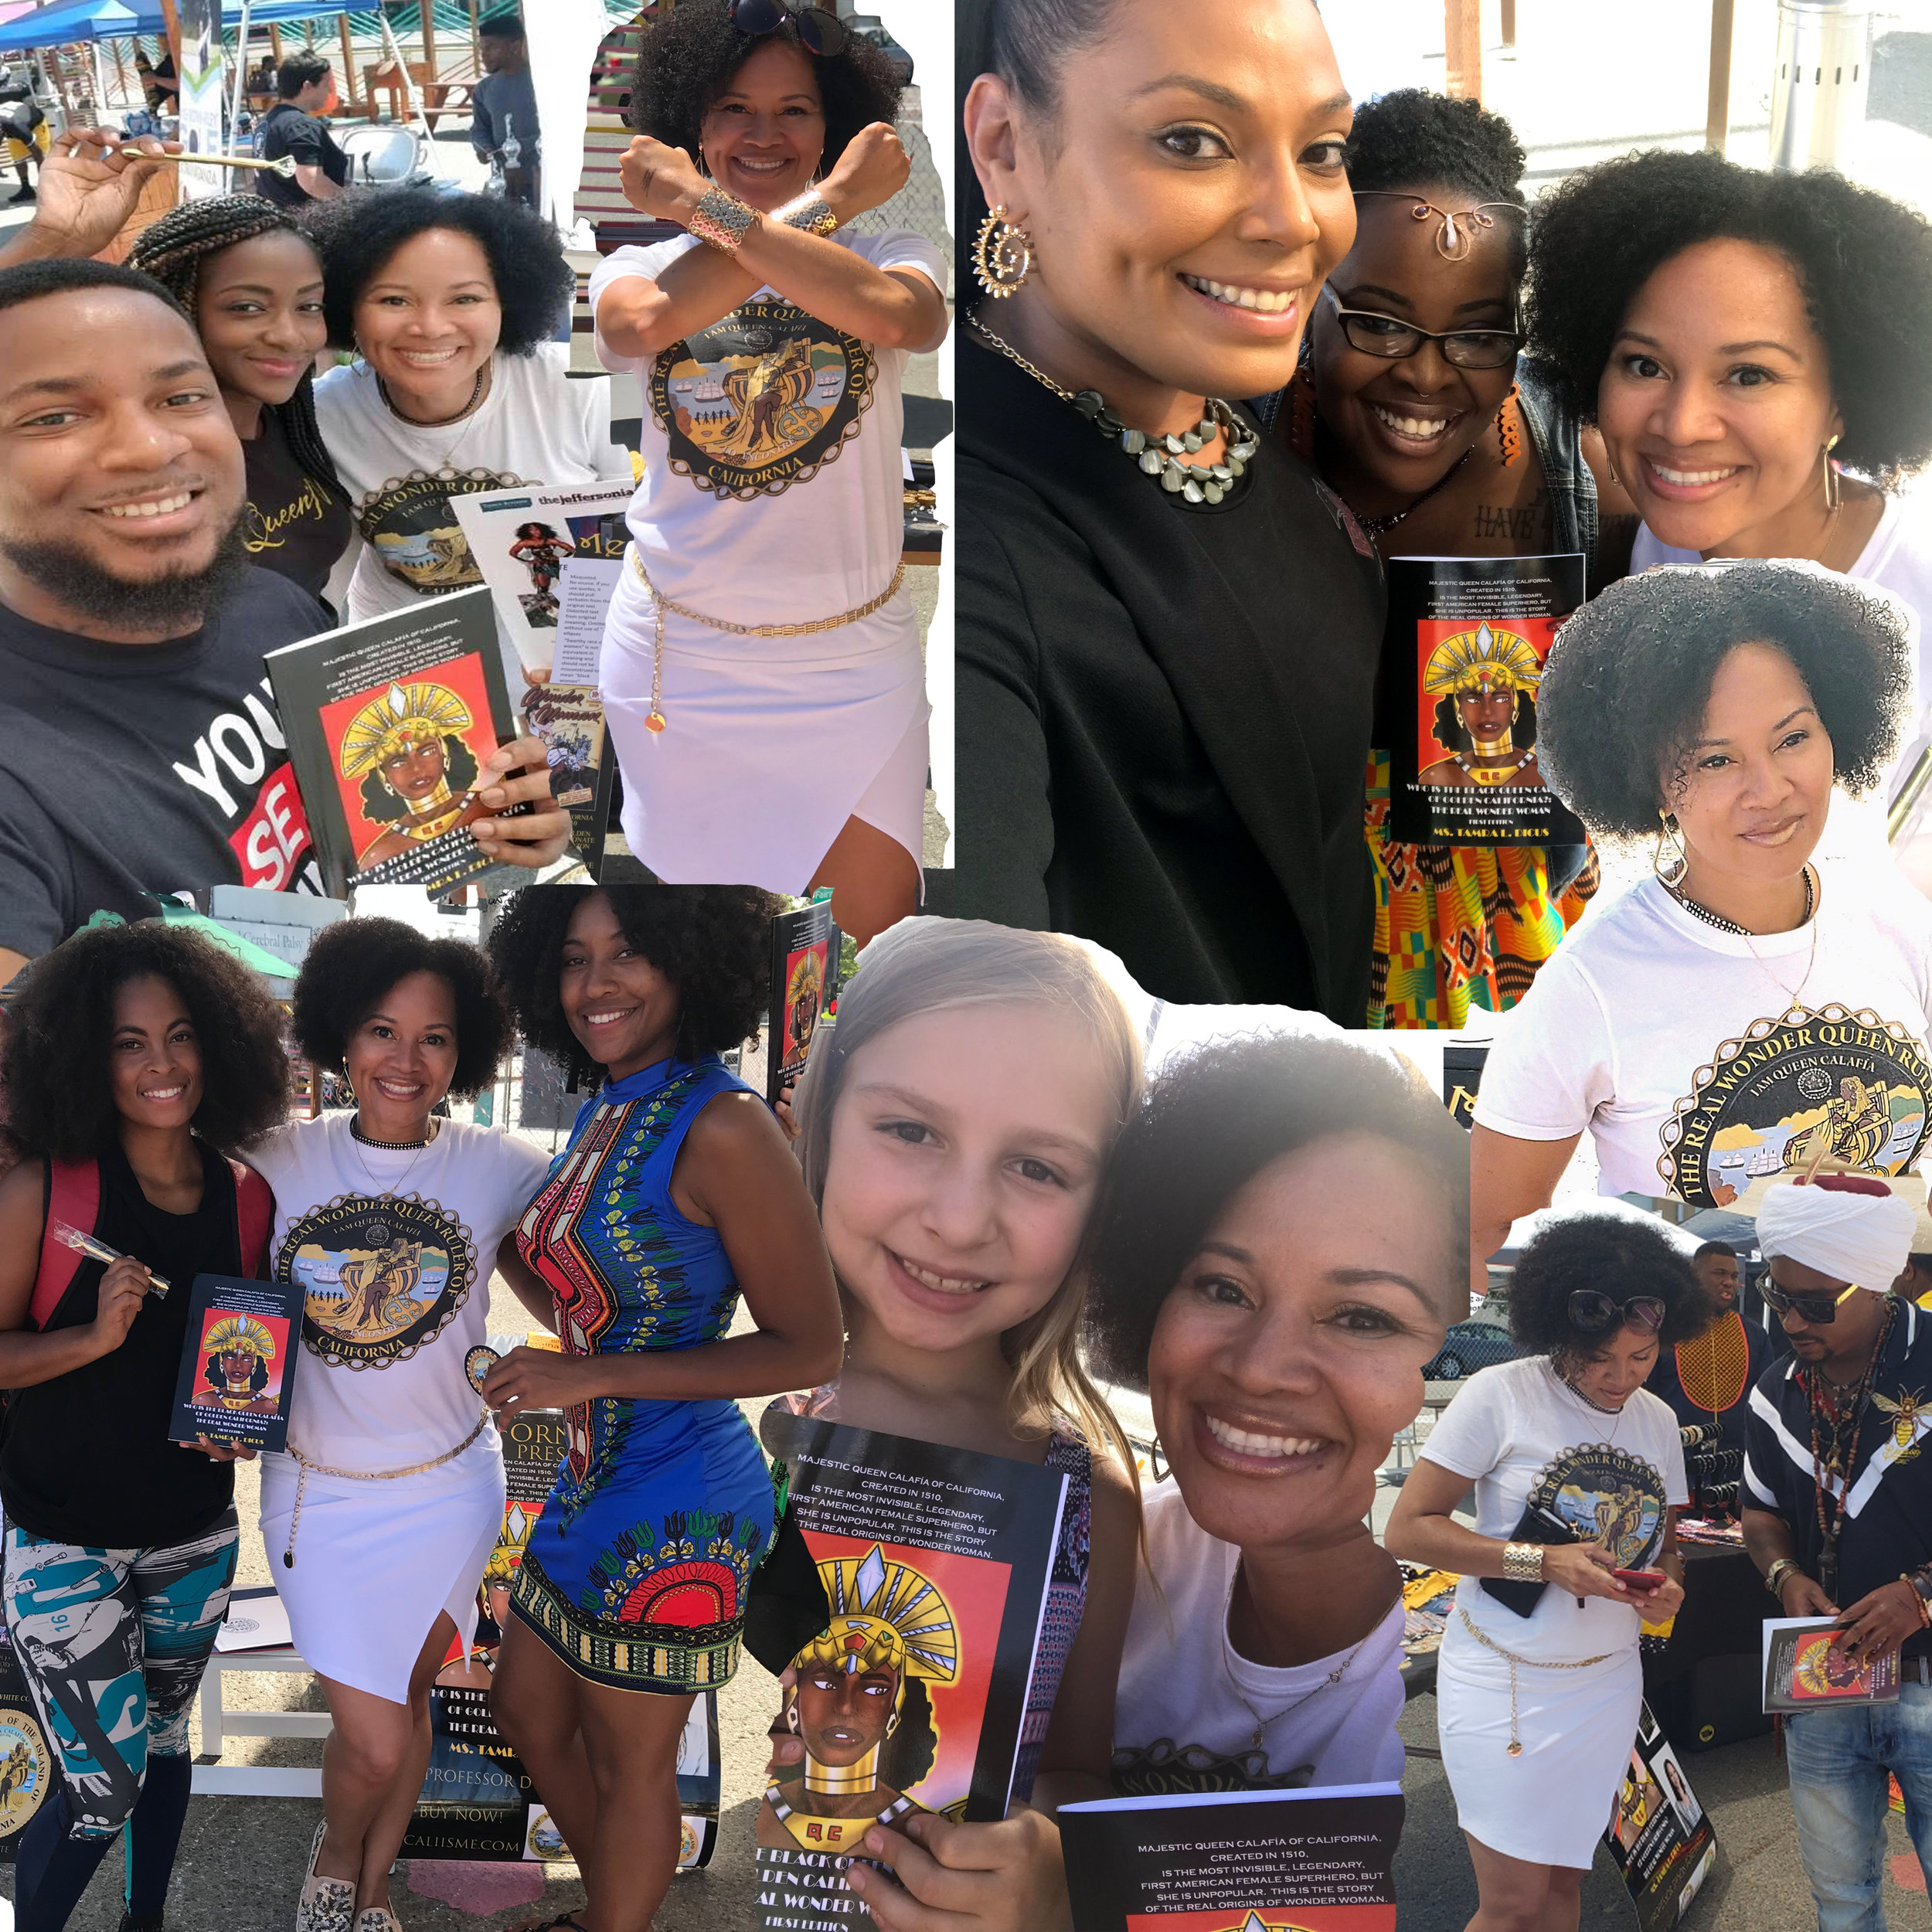 Young Blacks YnB Sept. 5 2018 collage.jpg